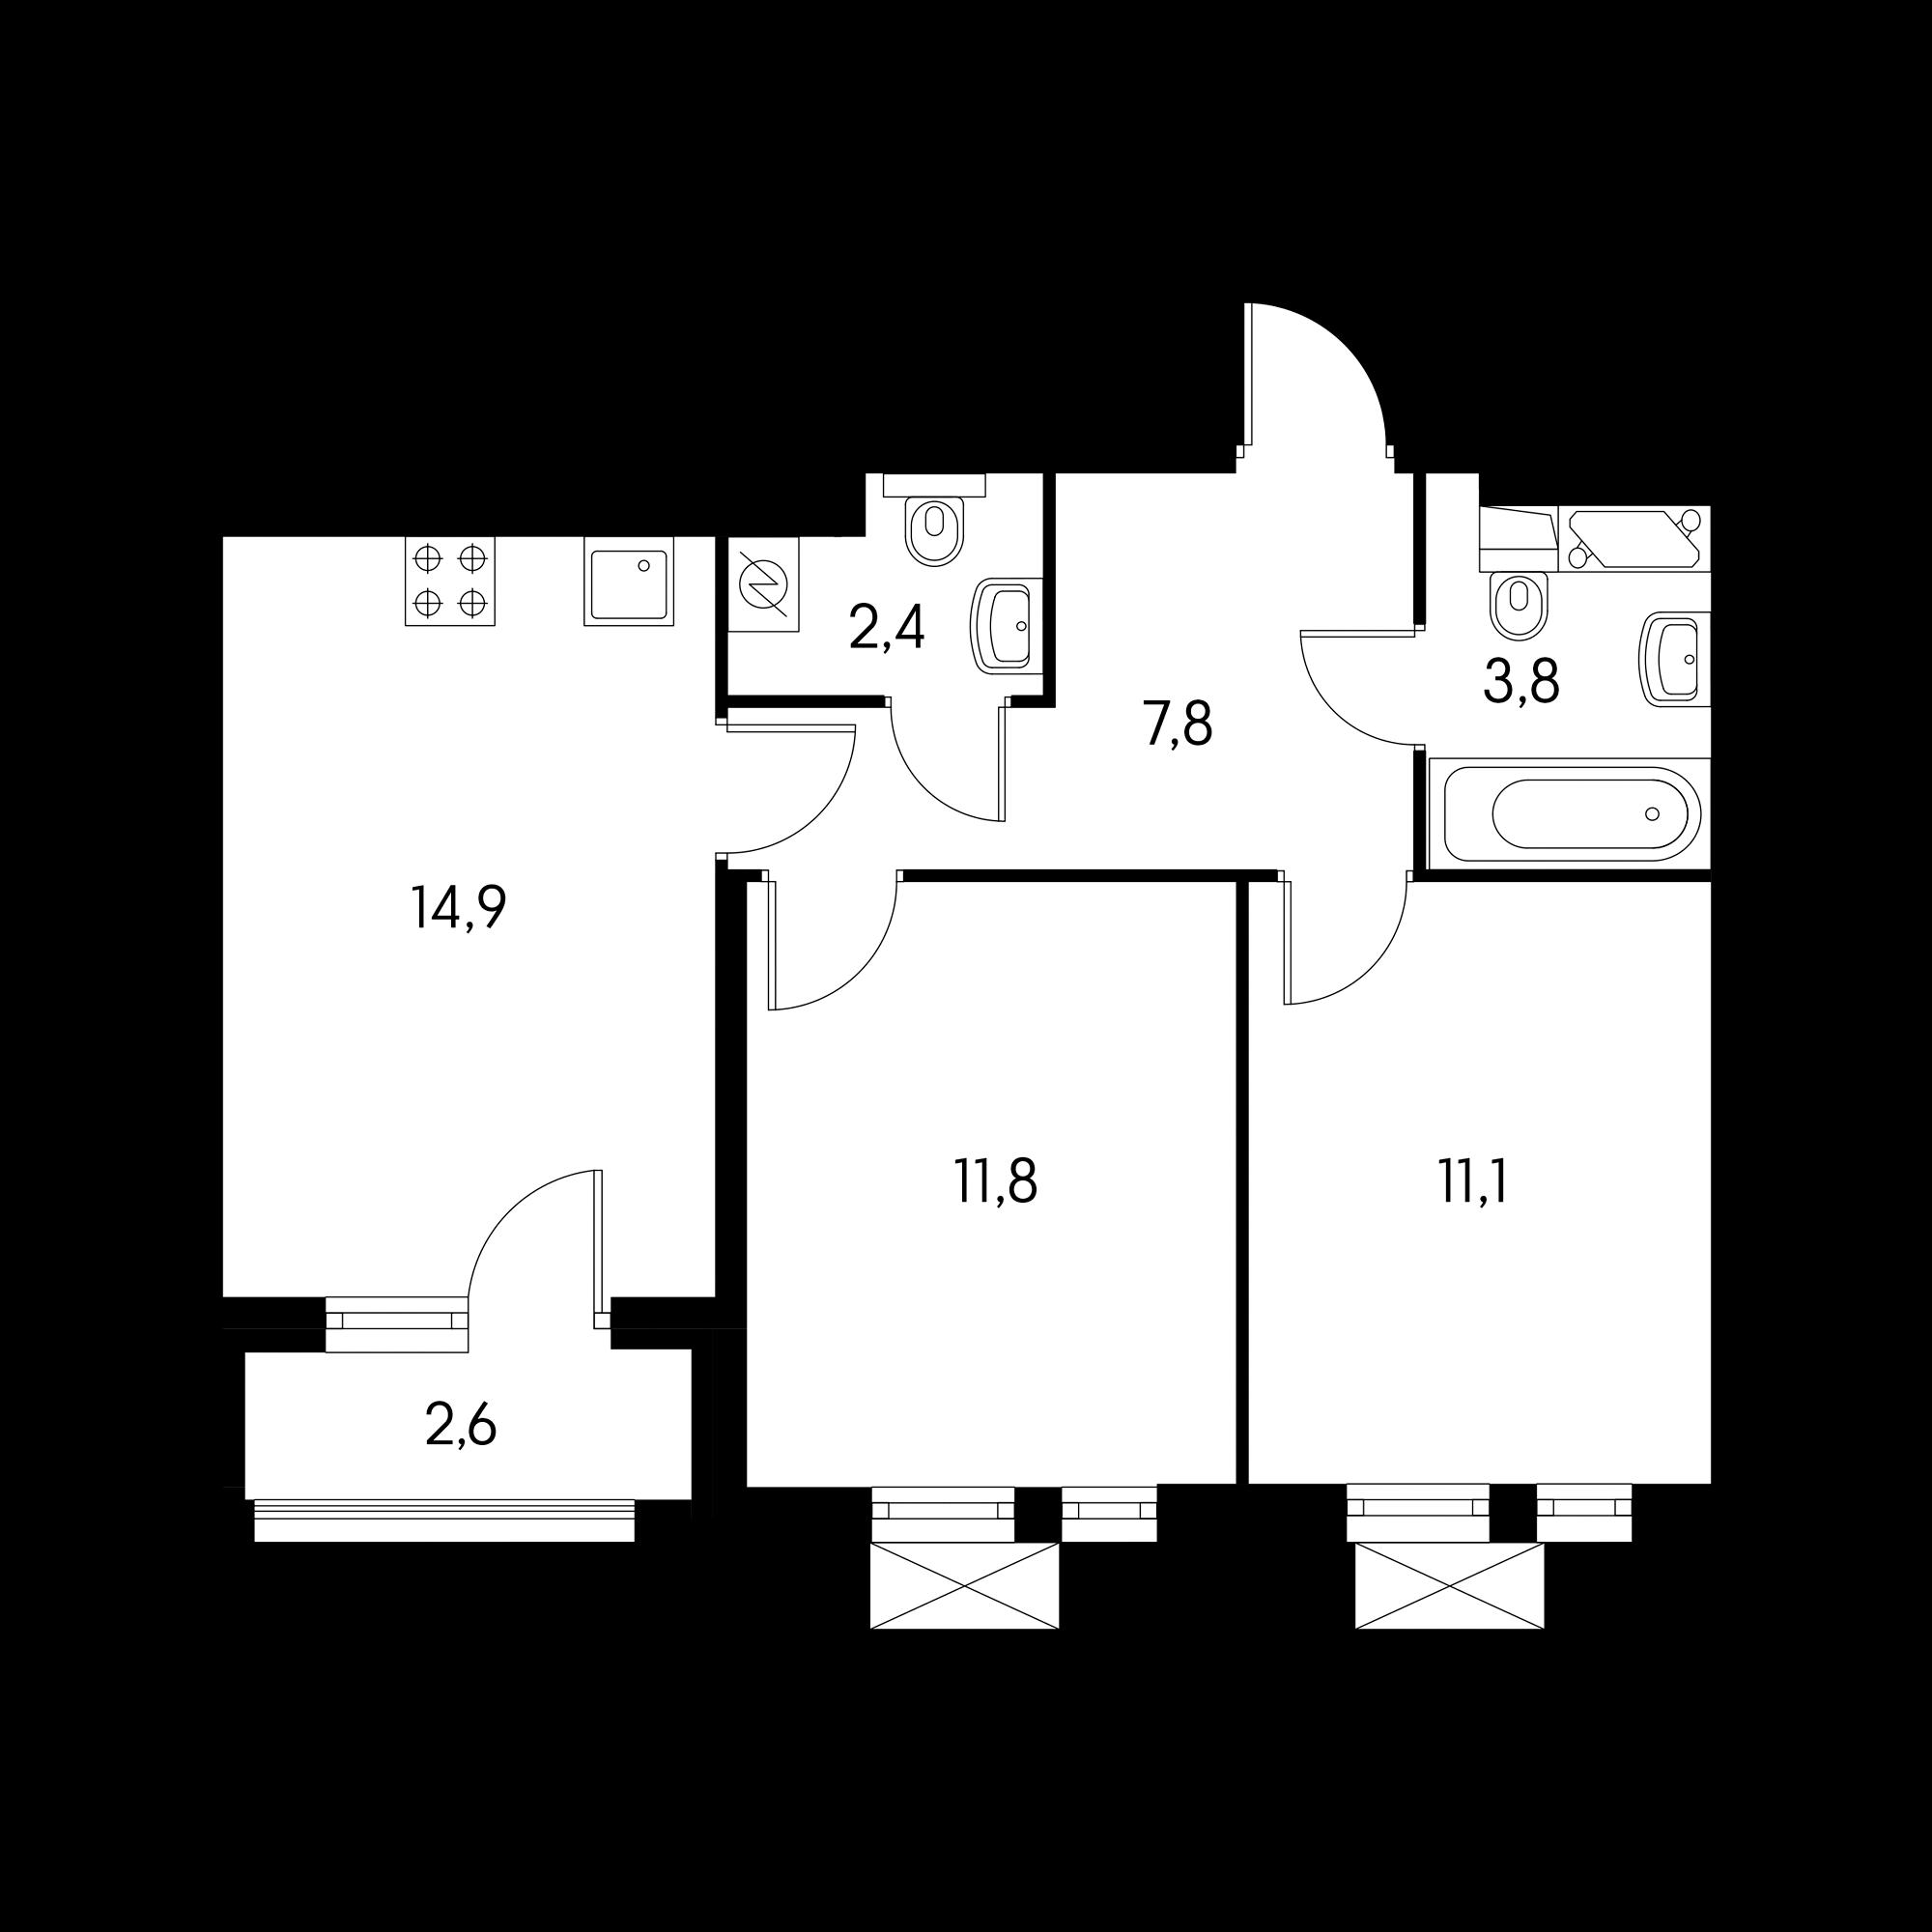 2-1(4)